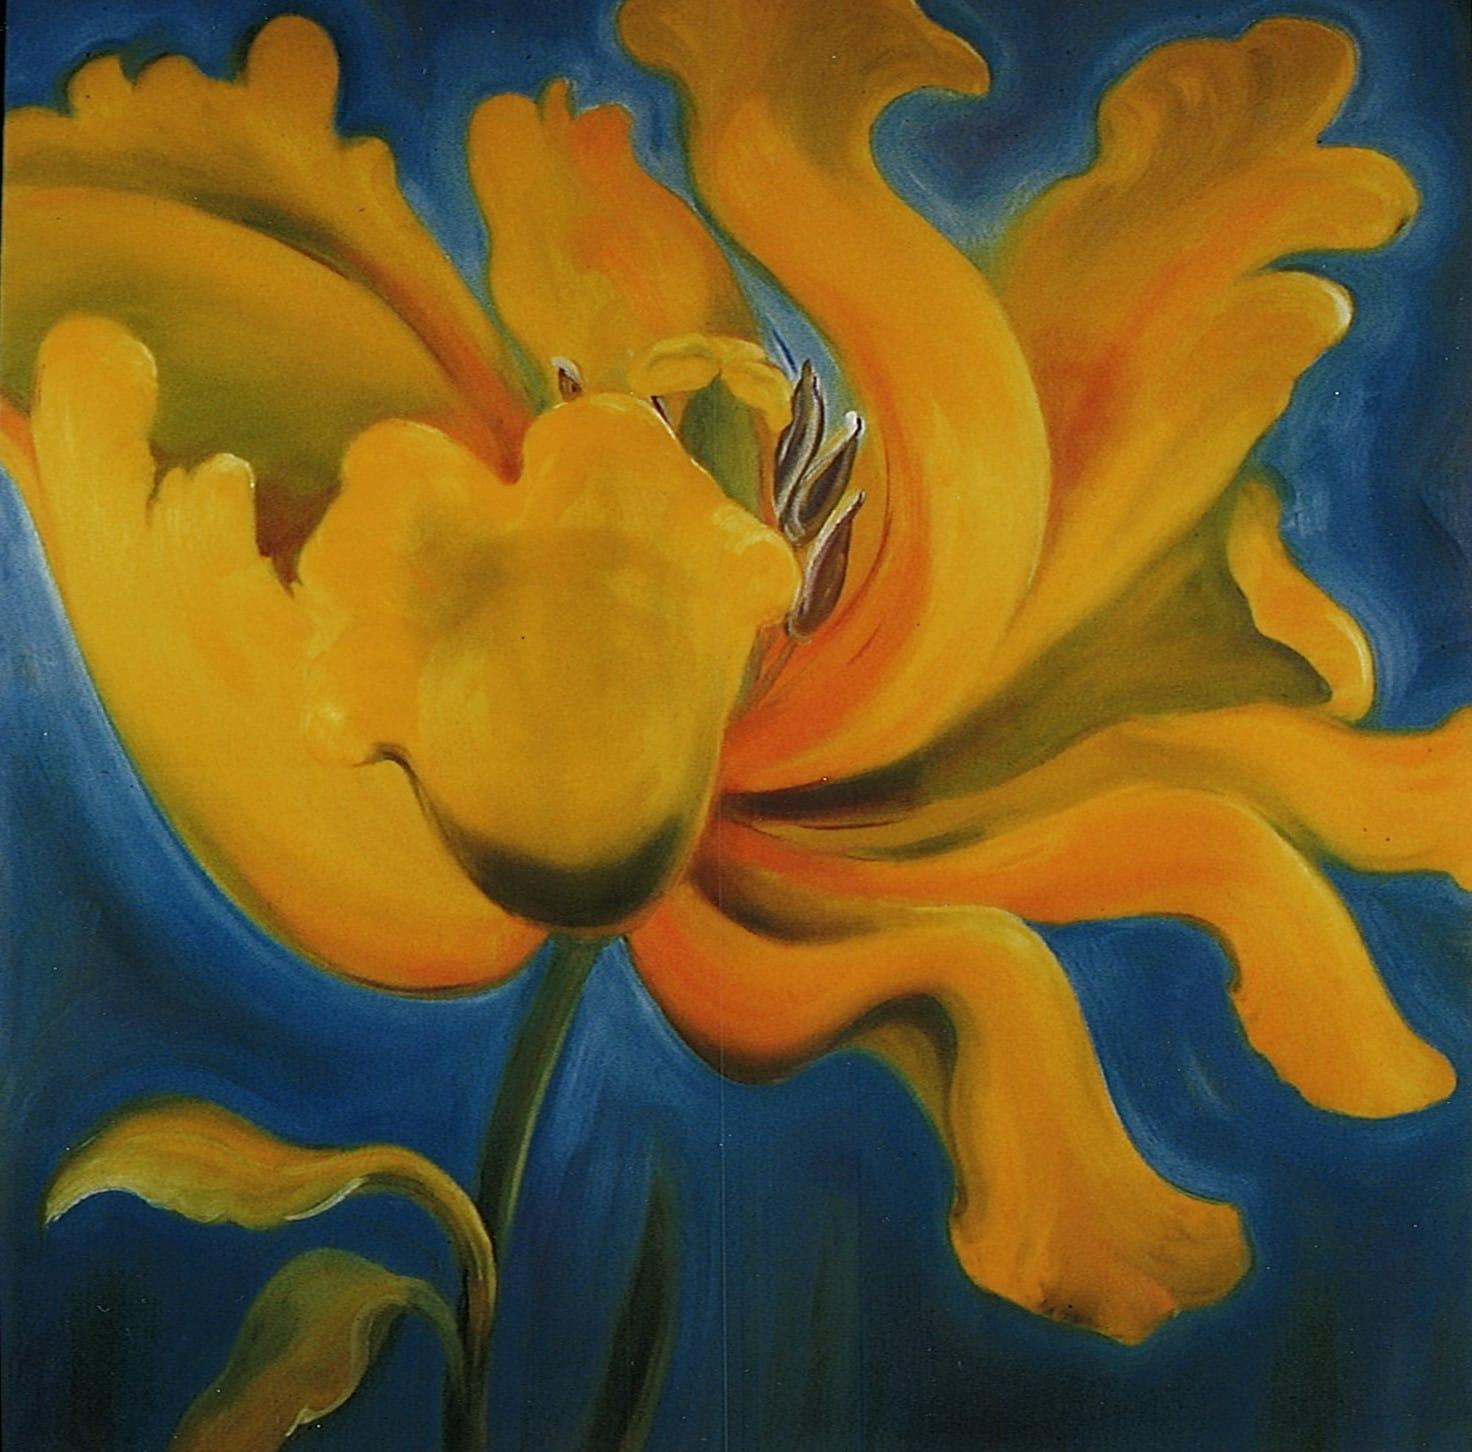 tulips_1992_2